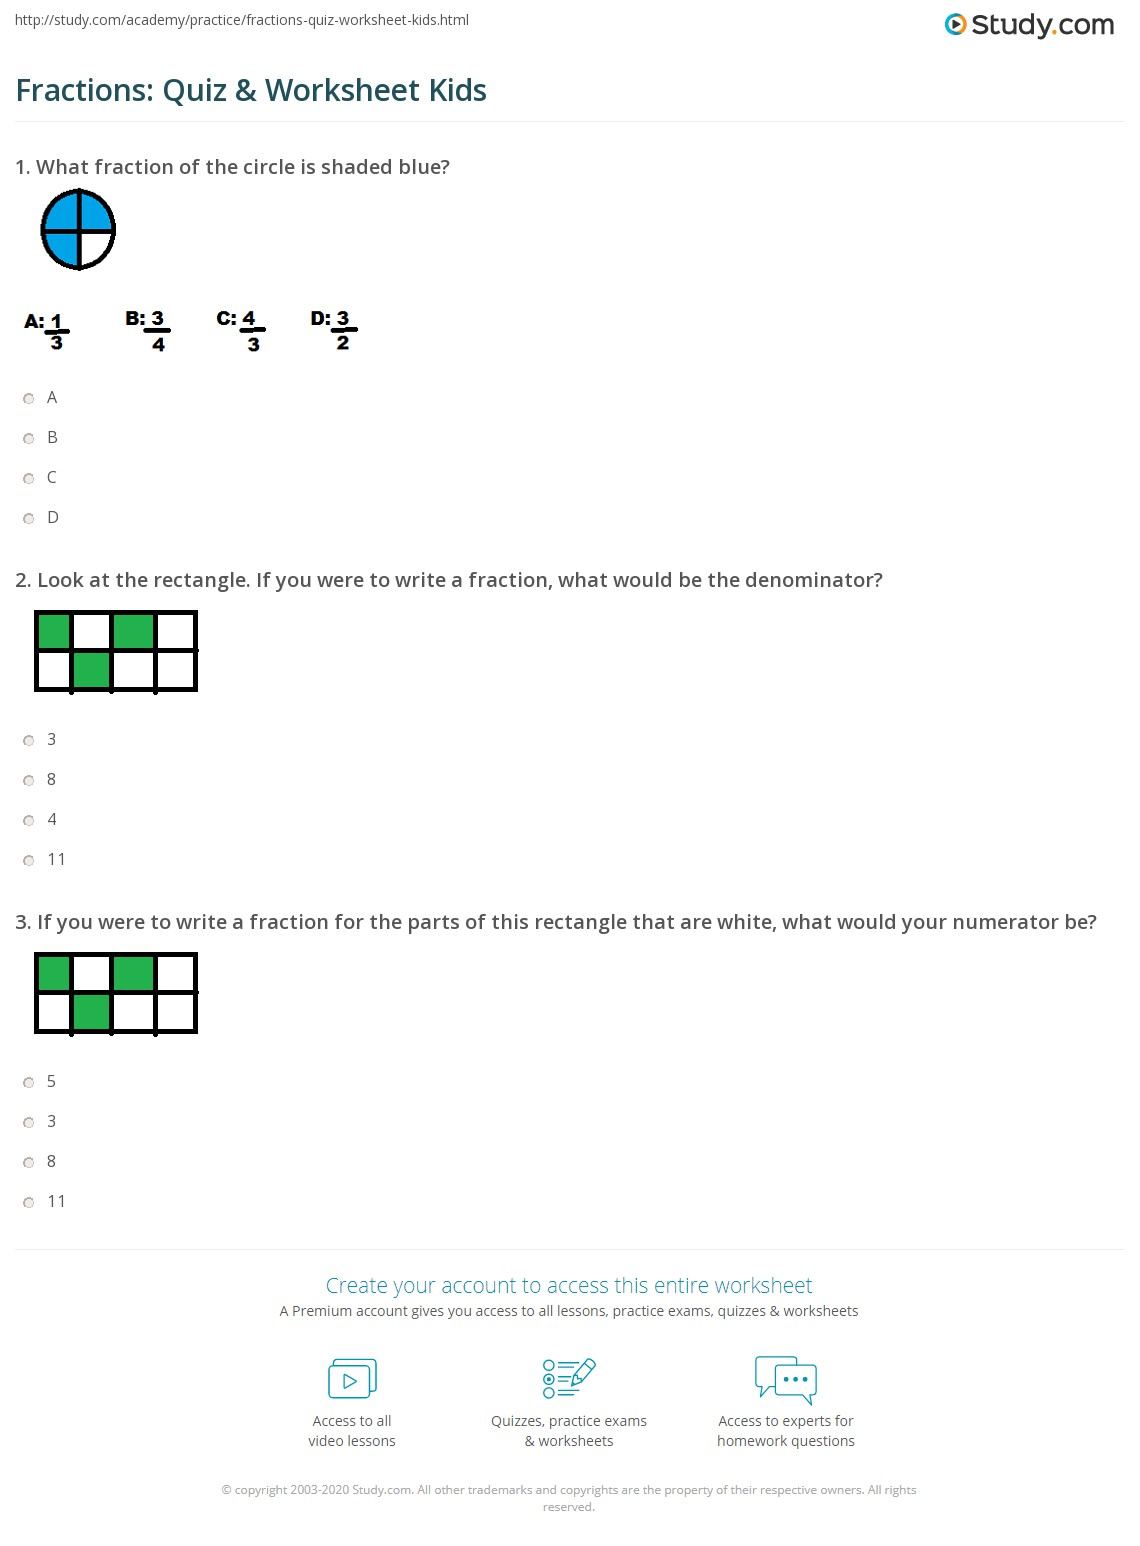 hight resolution of Fractions: Quiz \u0026 Worksheet Kids   Study.com